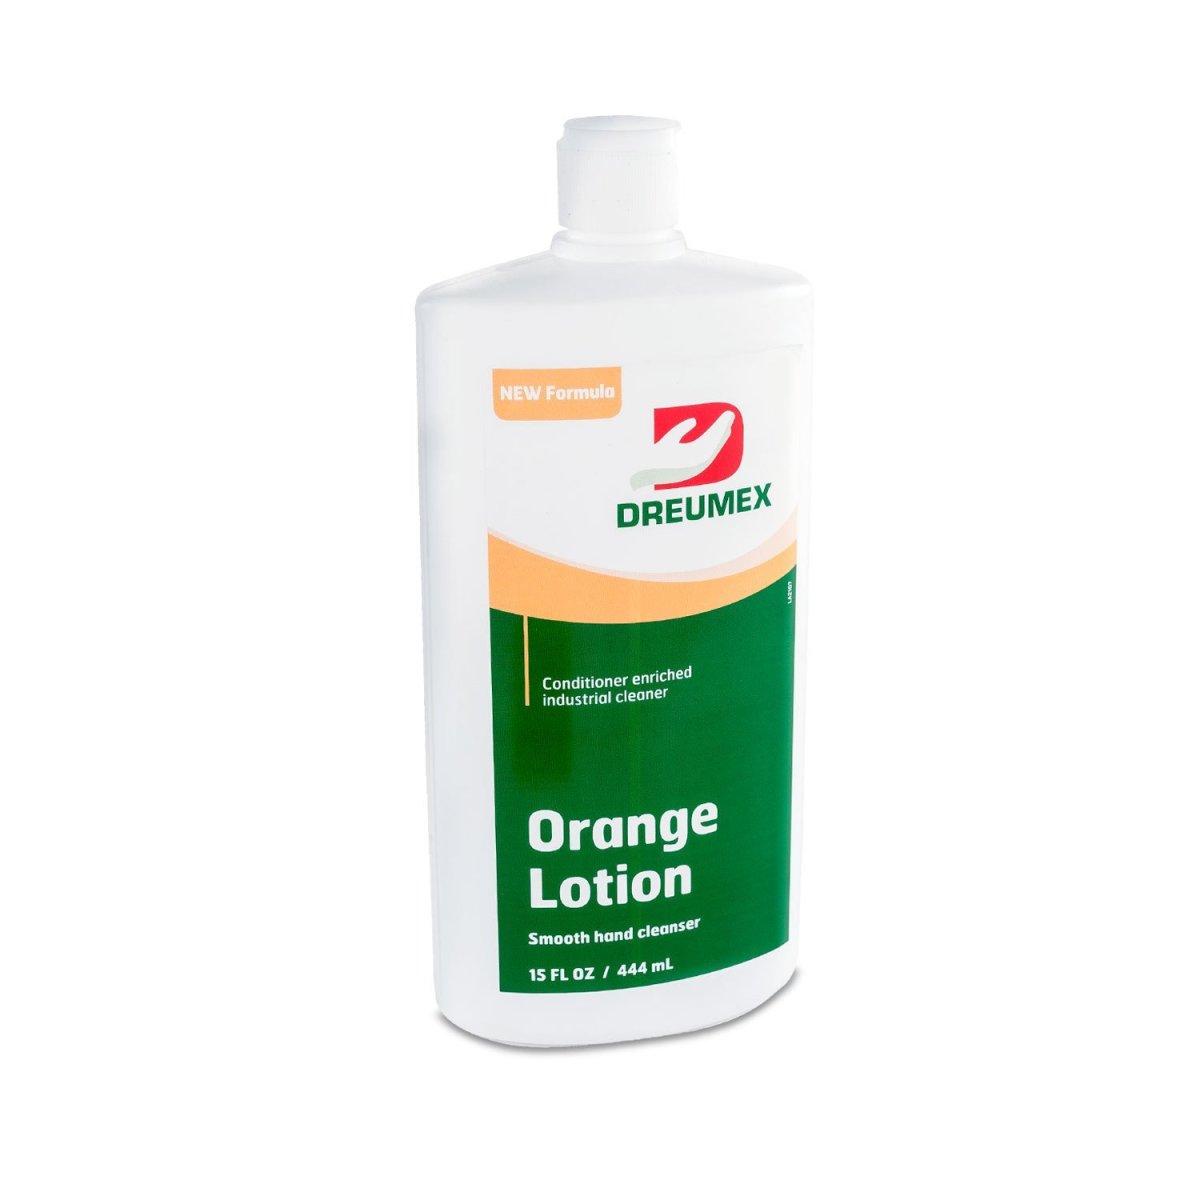 Dreumex Pumice Heavy Duty Hand Cleaner Orange Lotion Bottle